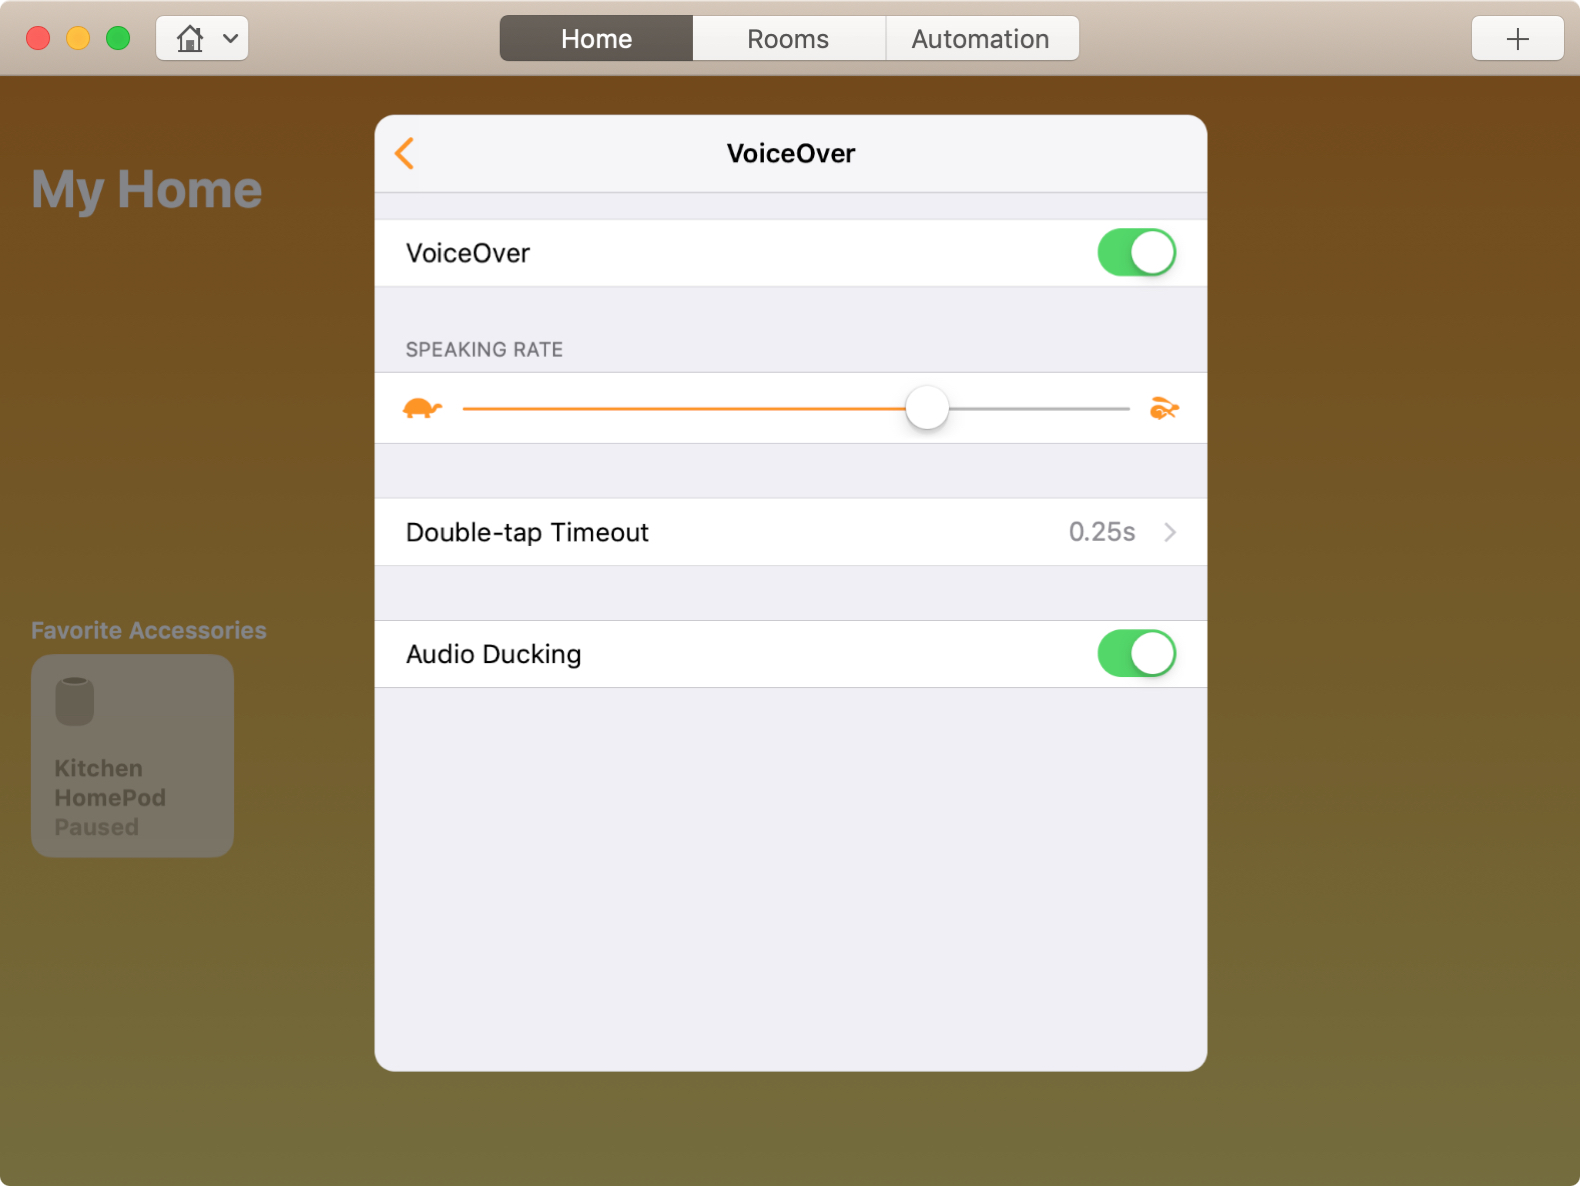 Habilitar VoiceOver para HomePod en Mac